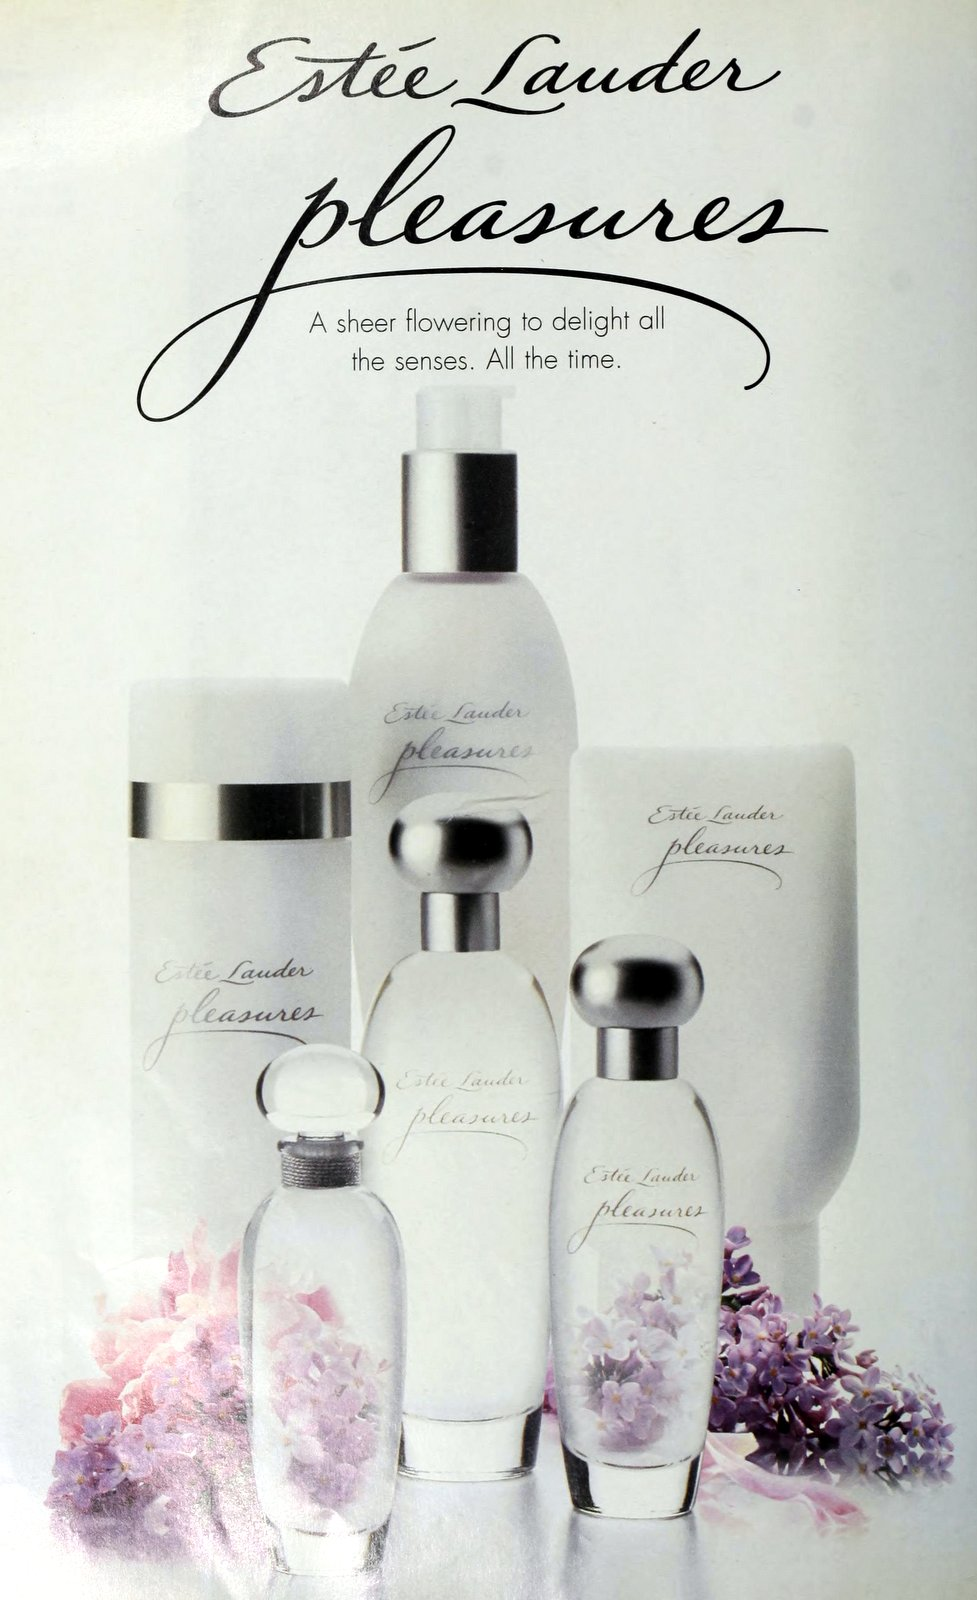 Pleasures from Estee Lauder (1998) at ClickAmericana.com